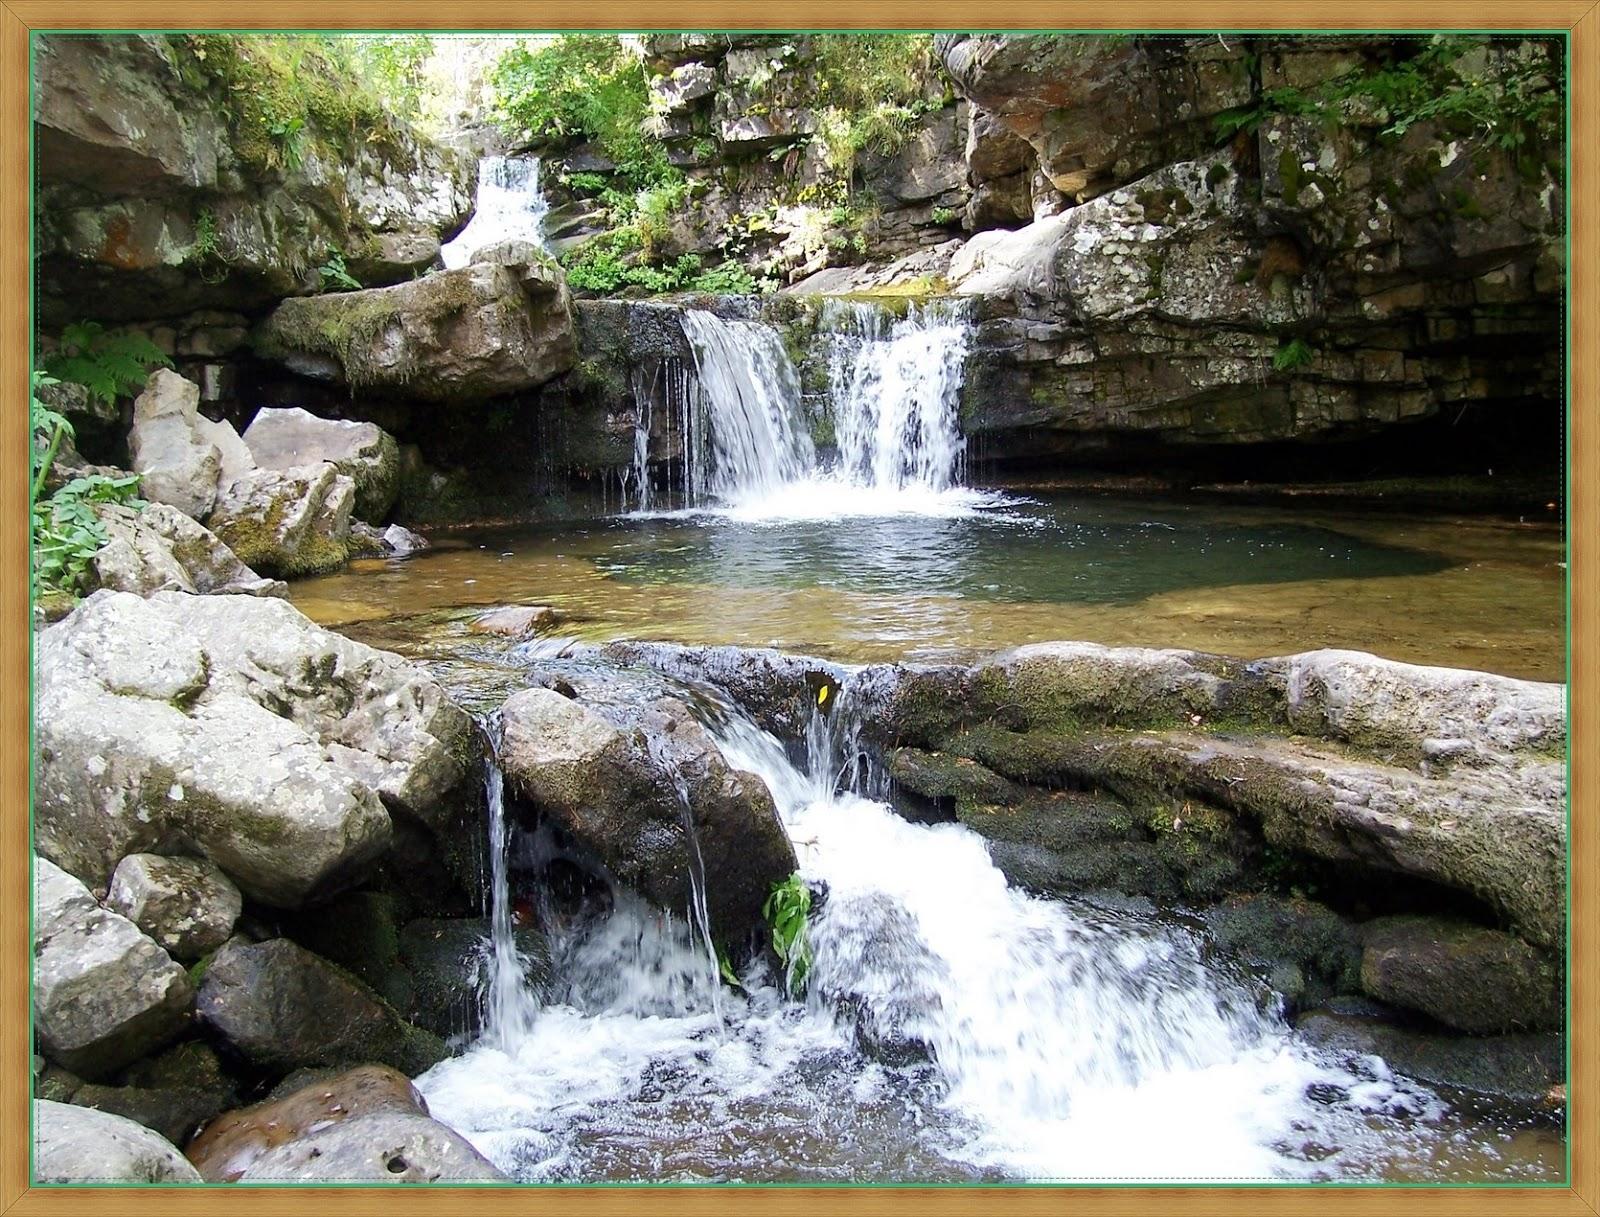 Cascadas de euskadi y alrededores agosto 2015 for Cascada par